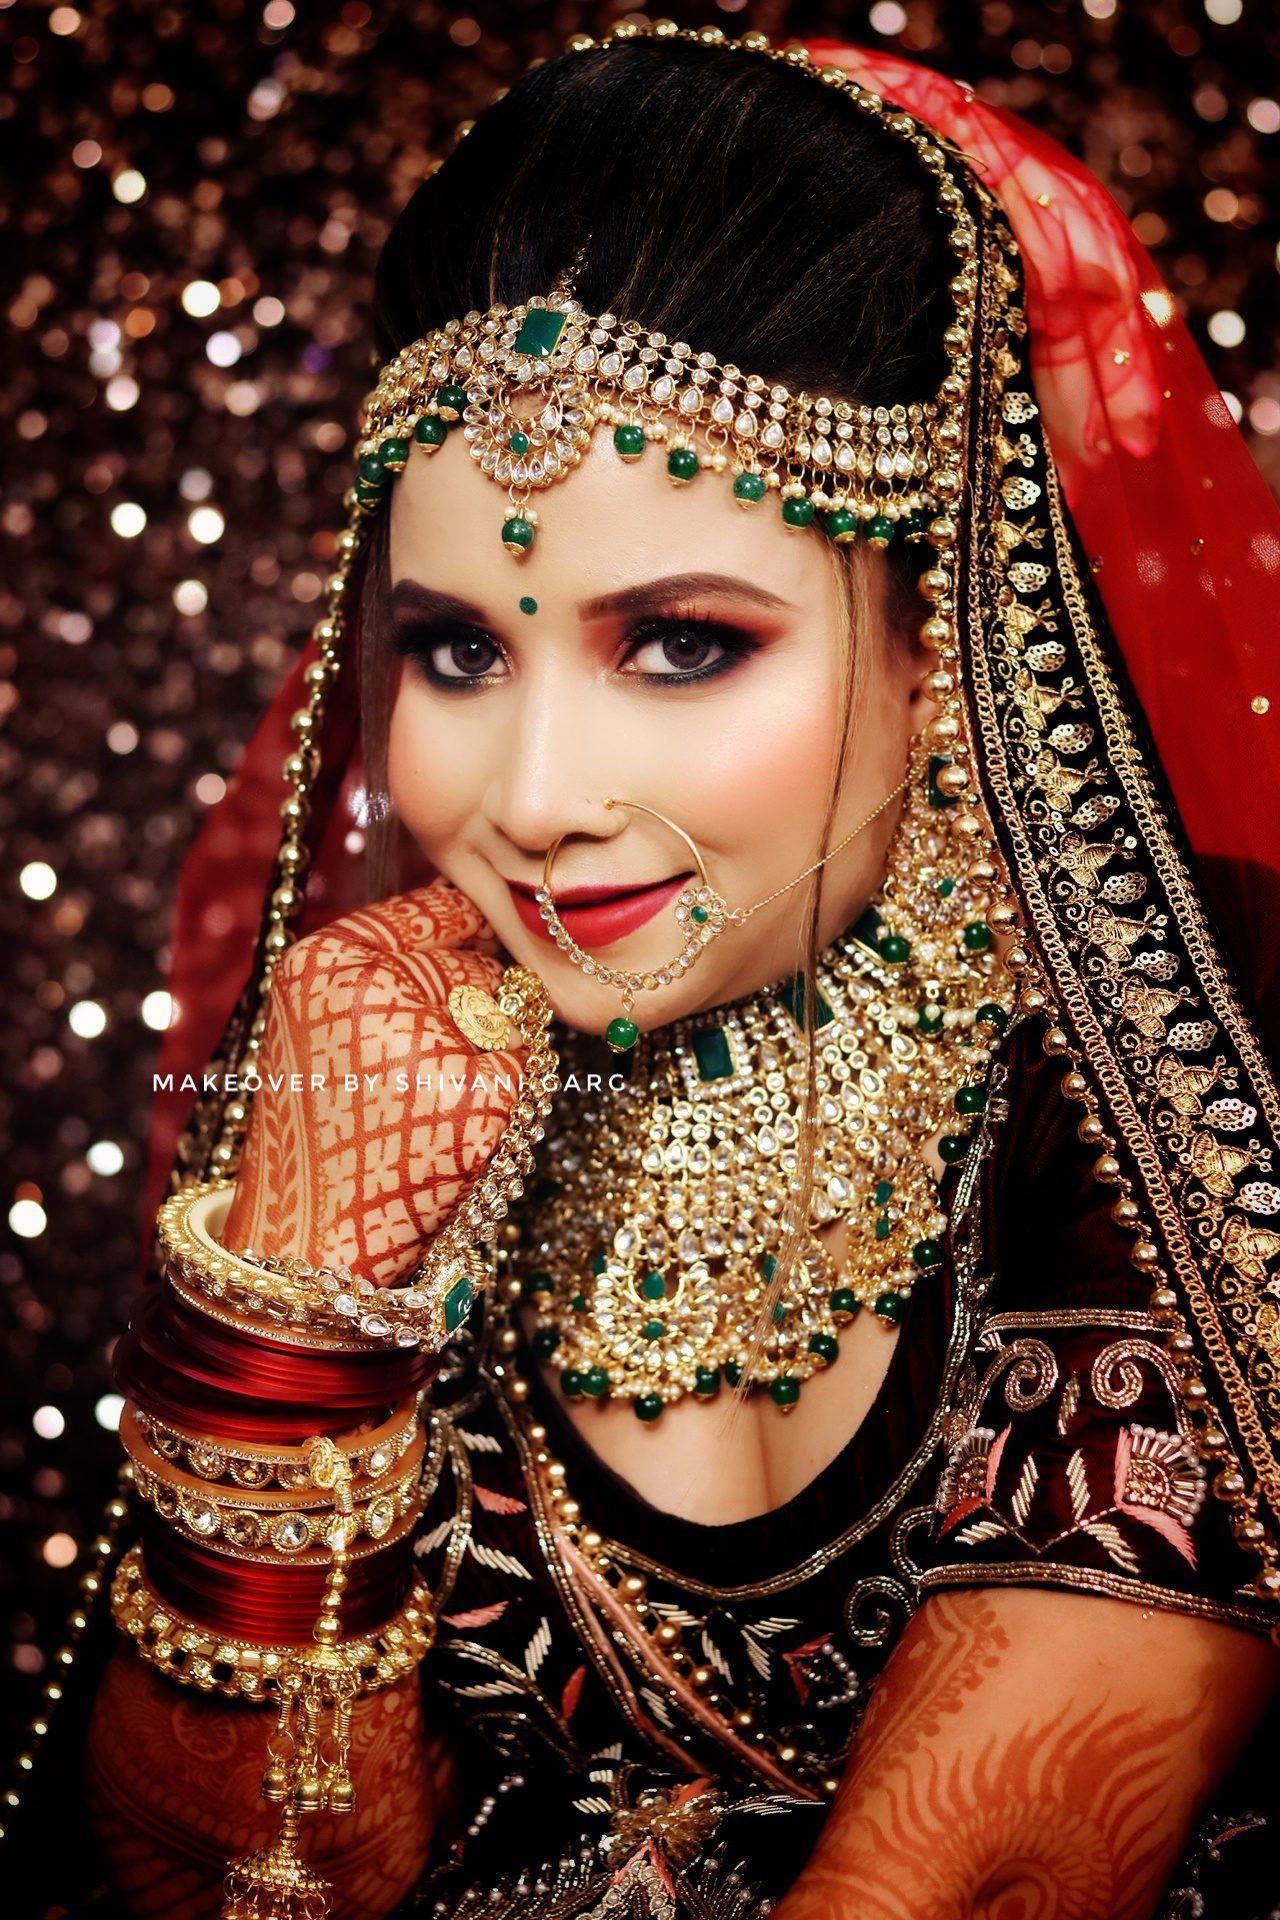 pre wedding makeup package Delhi